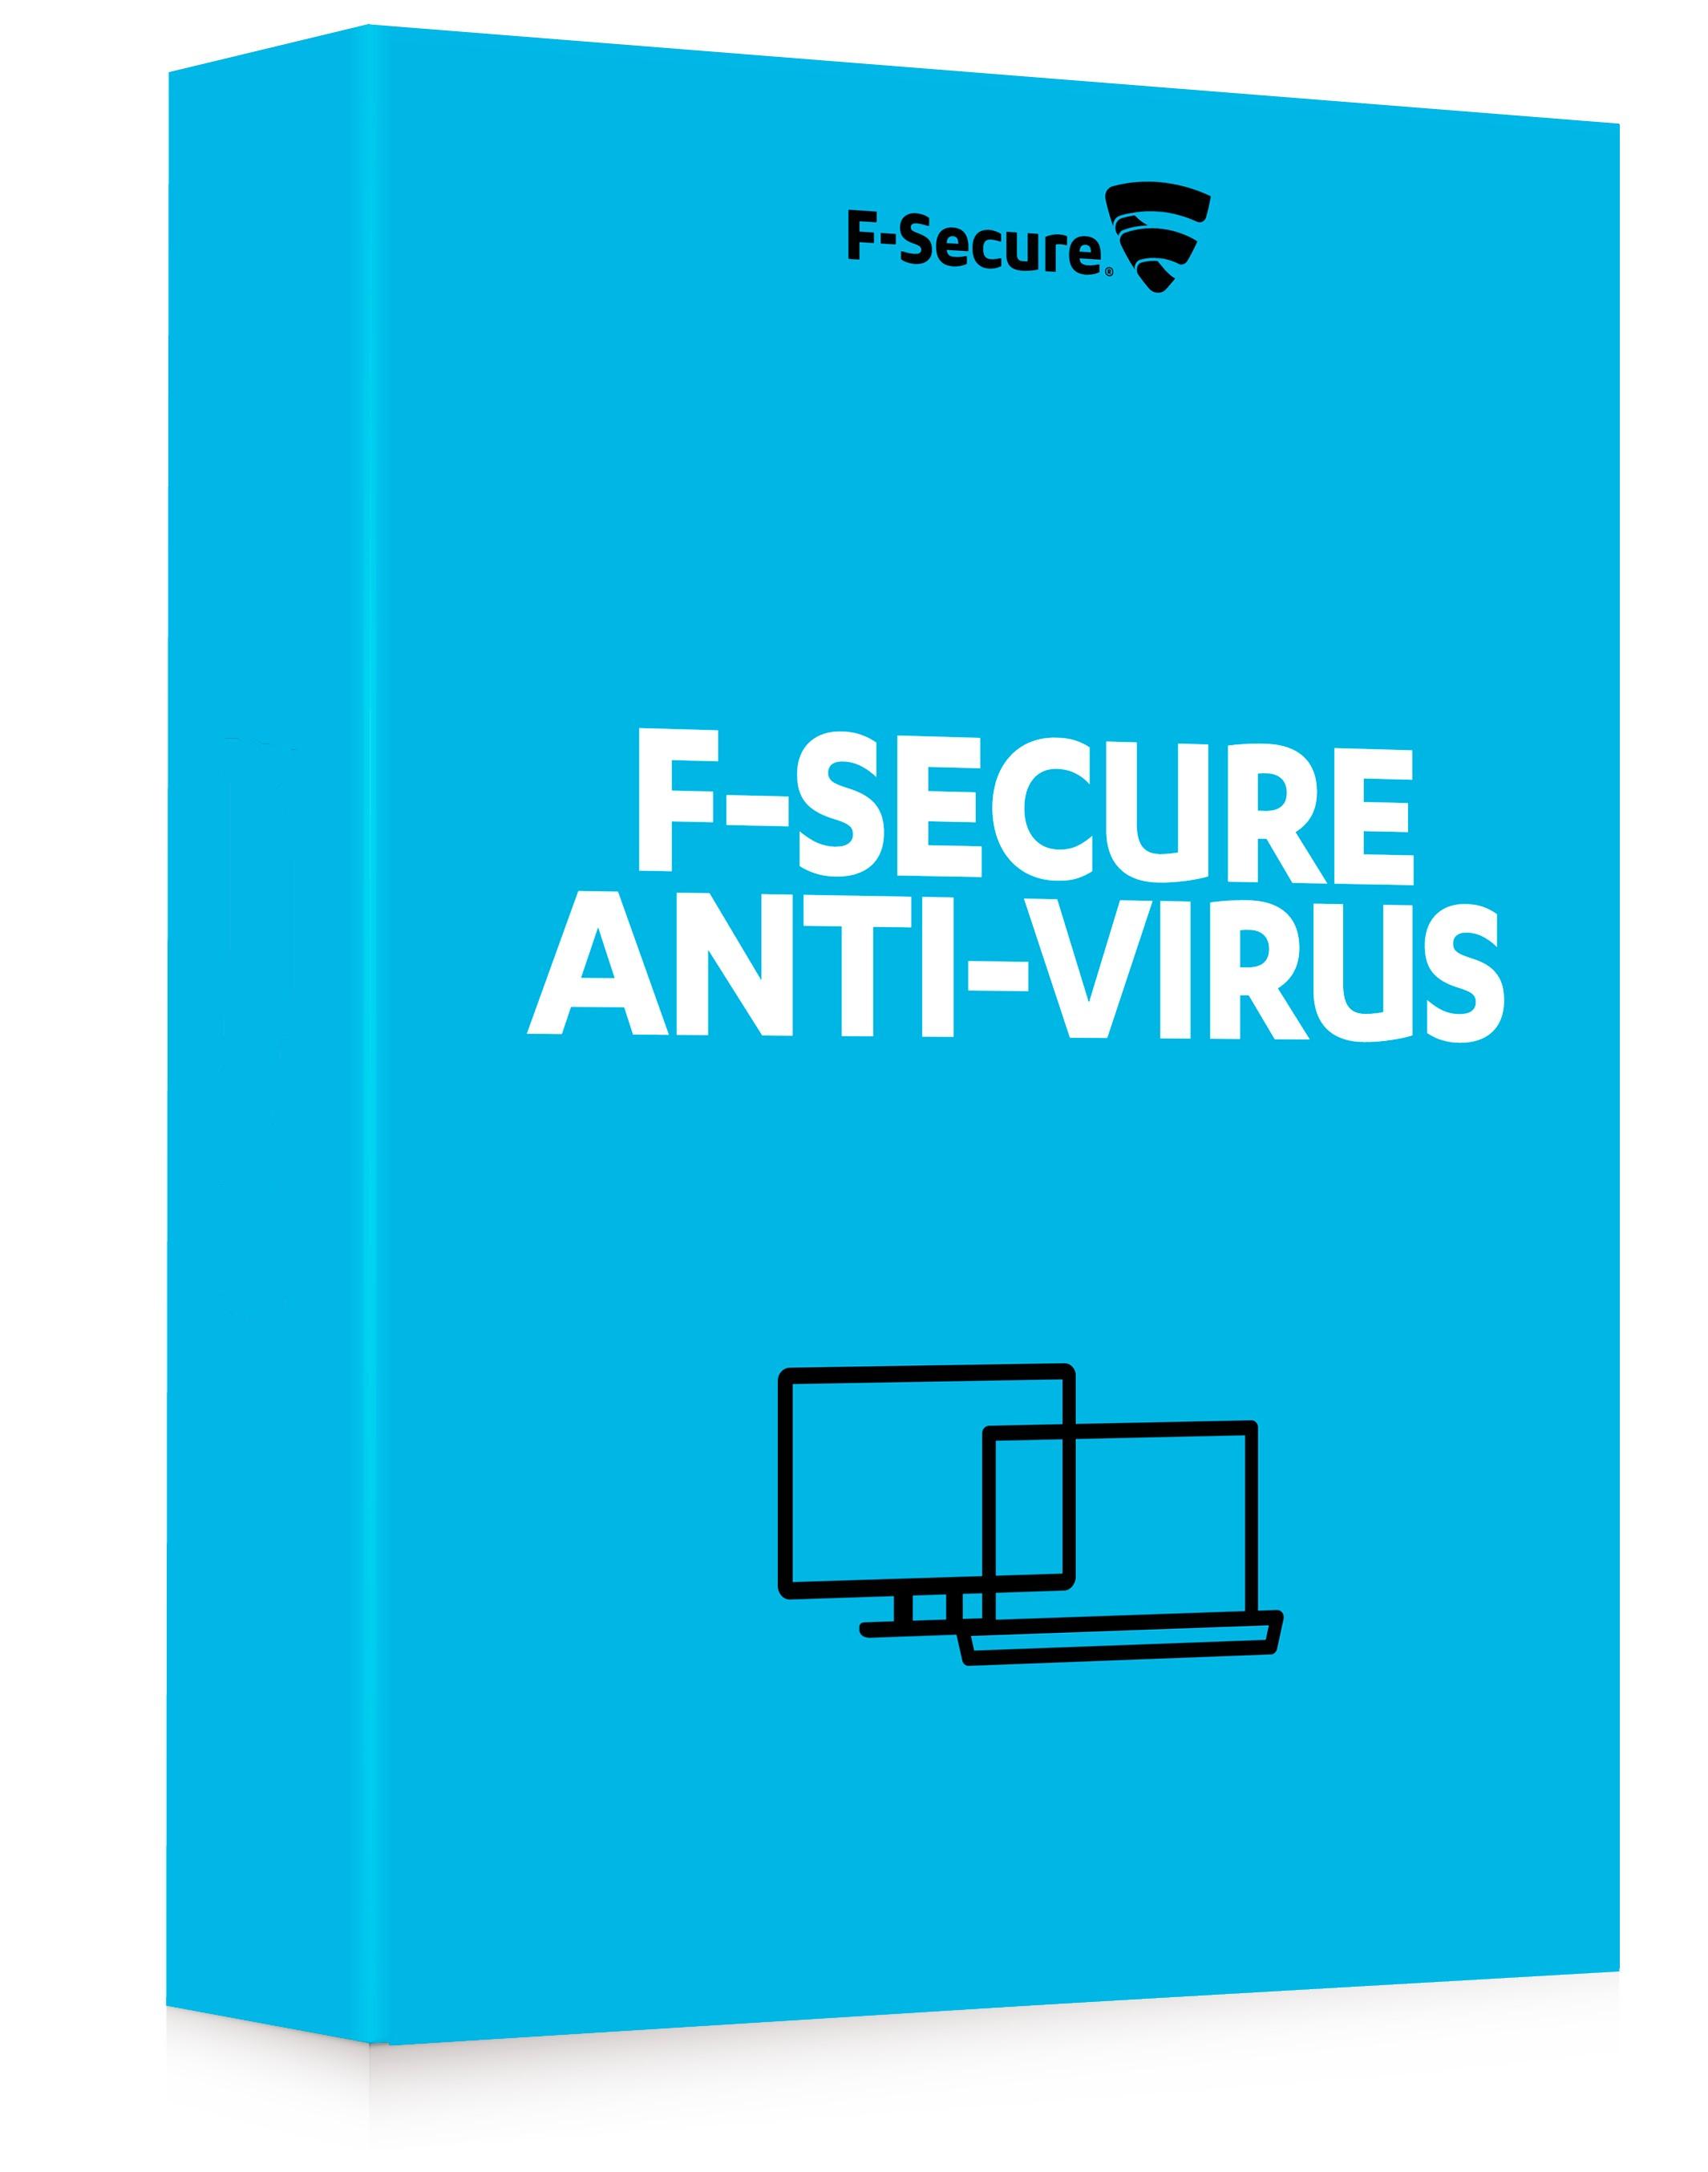 1 año de antivirus GRATIS  ️ (PVP: 80€)